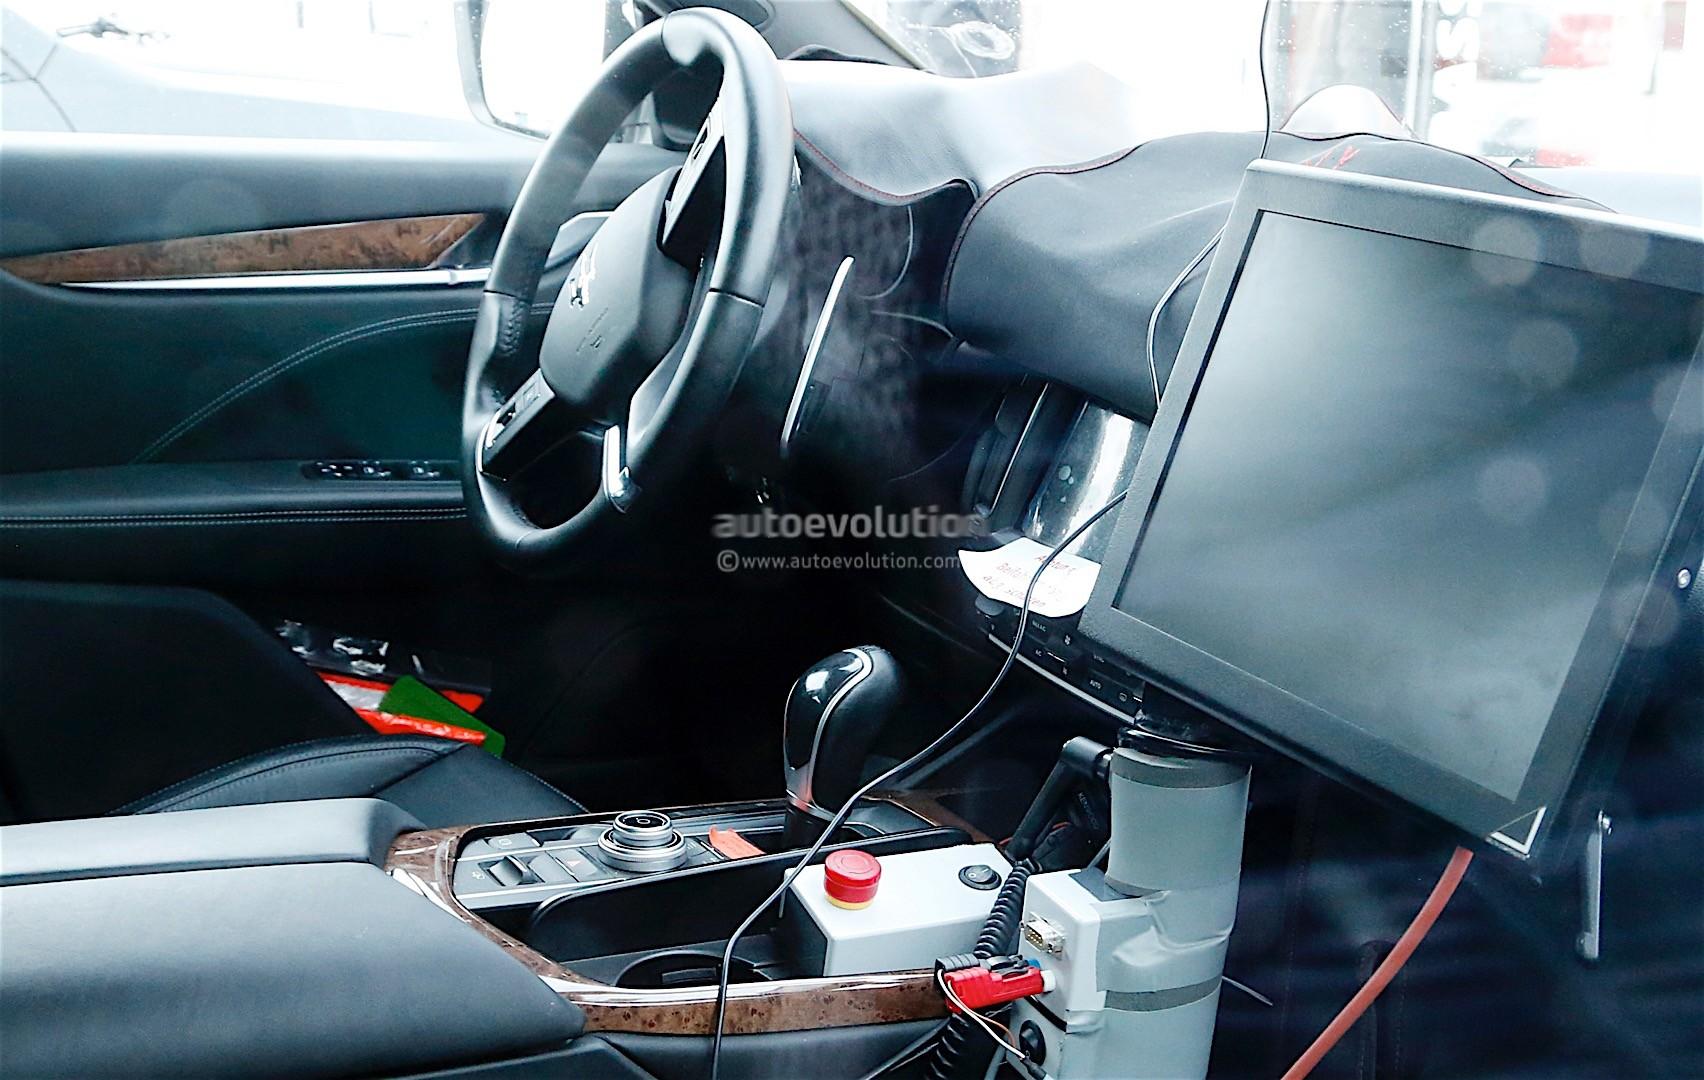 2017 Maserati Levante Spy Shots Reveal Interior Of The